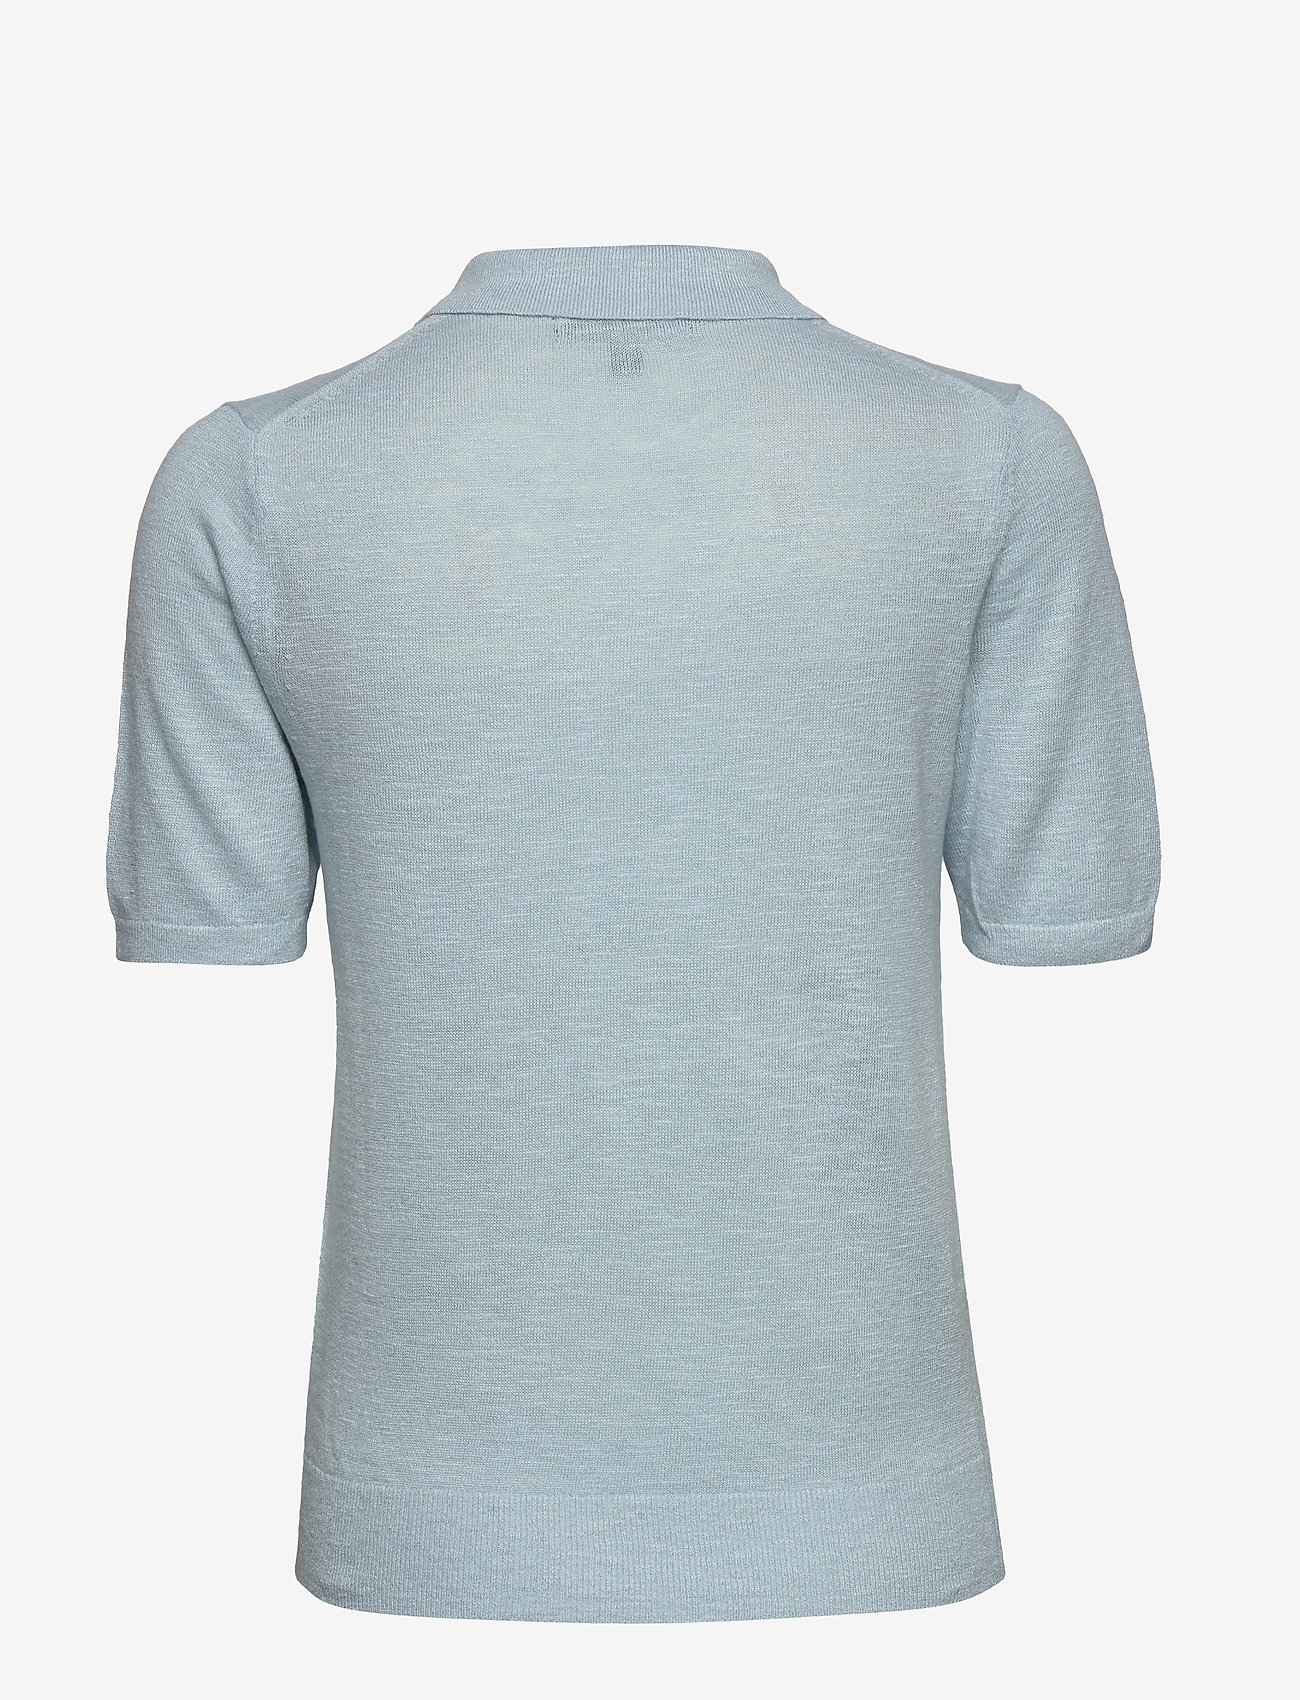 Banana Republic - Linen-Blend Sweater Polo - knitted tops - light blue - 1